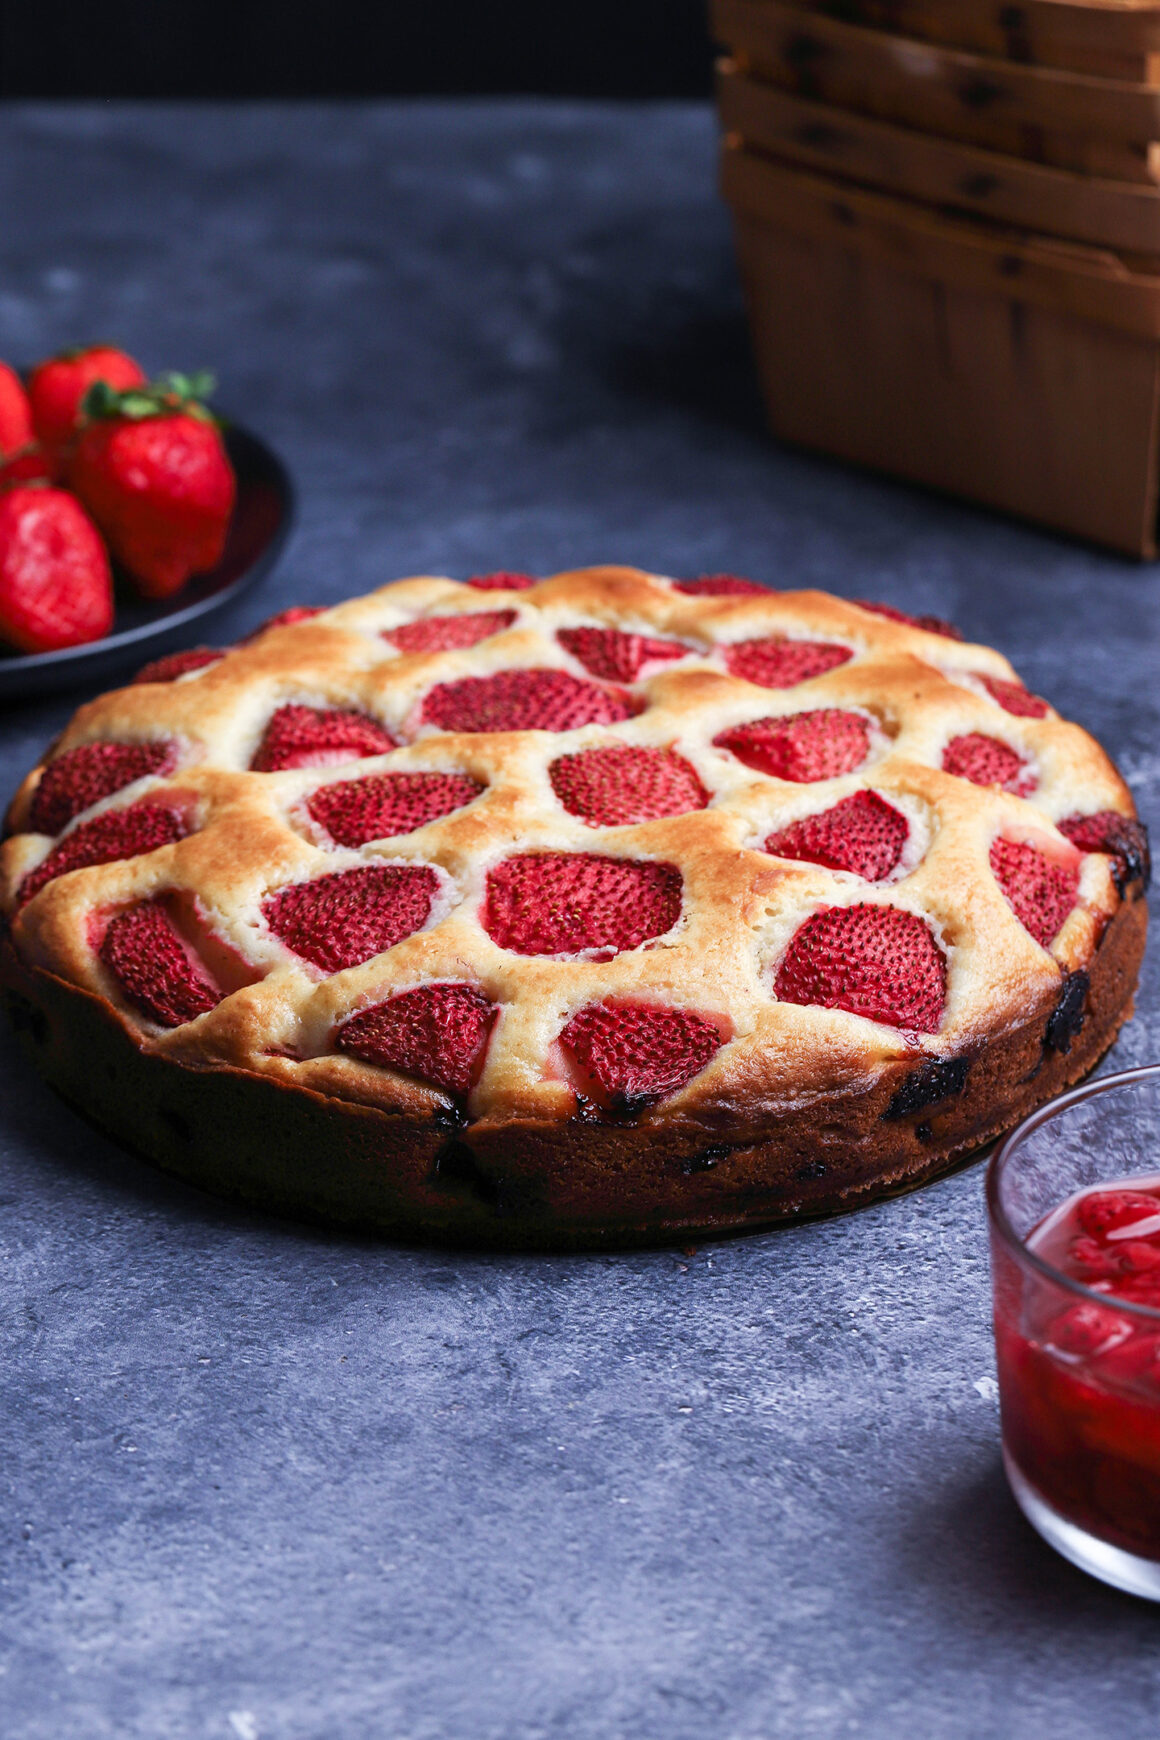 strawberry-cake with strawberry sauce